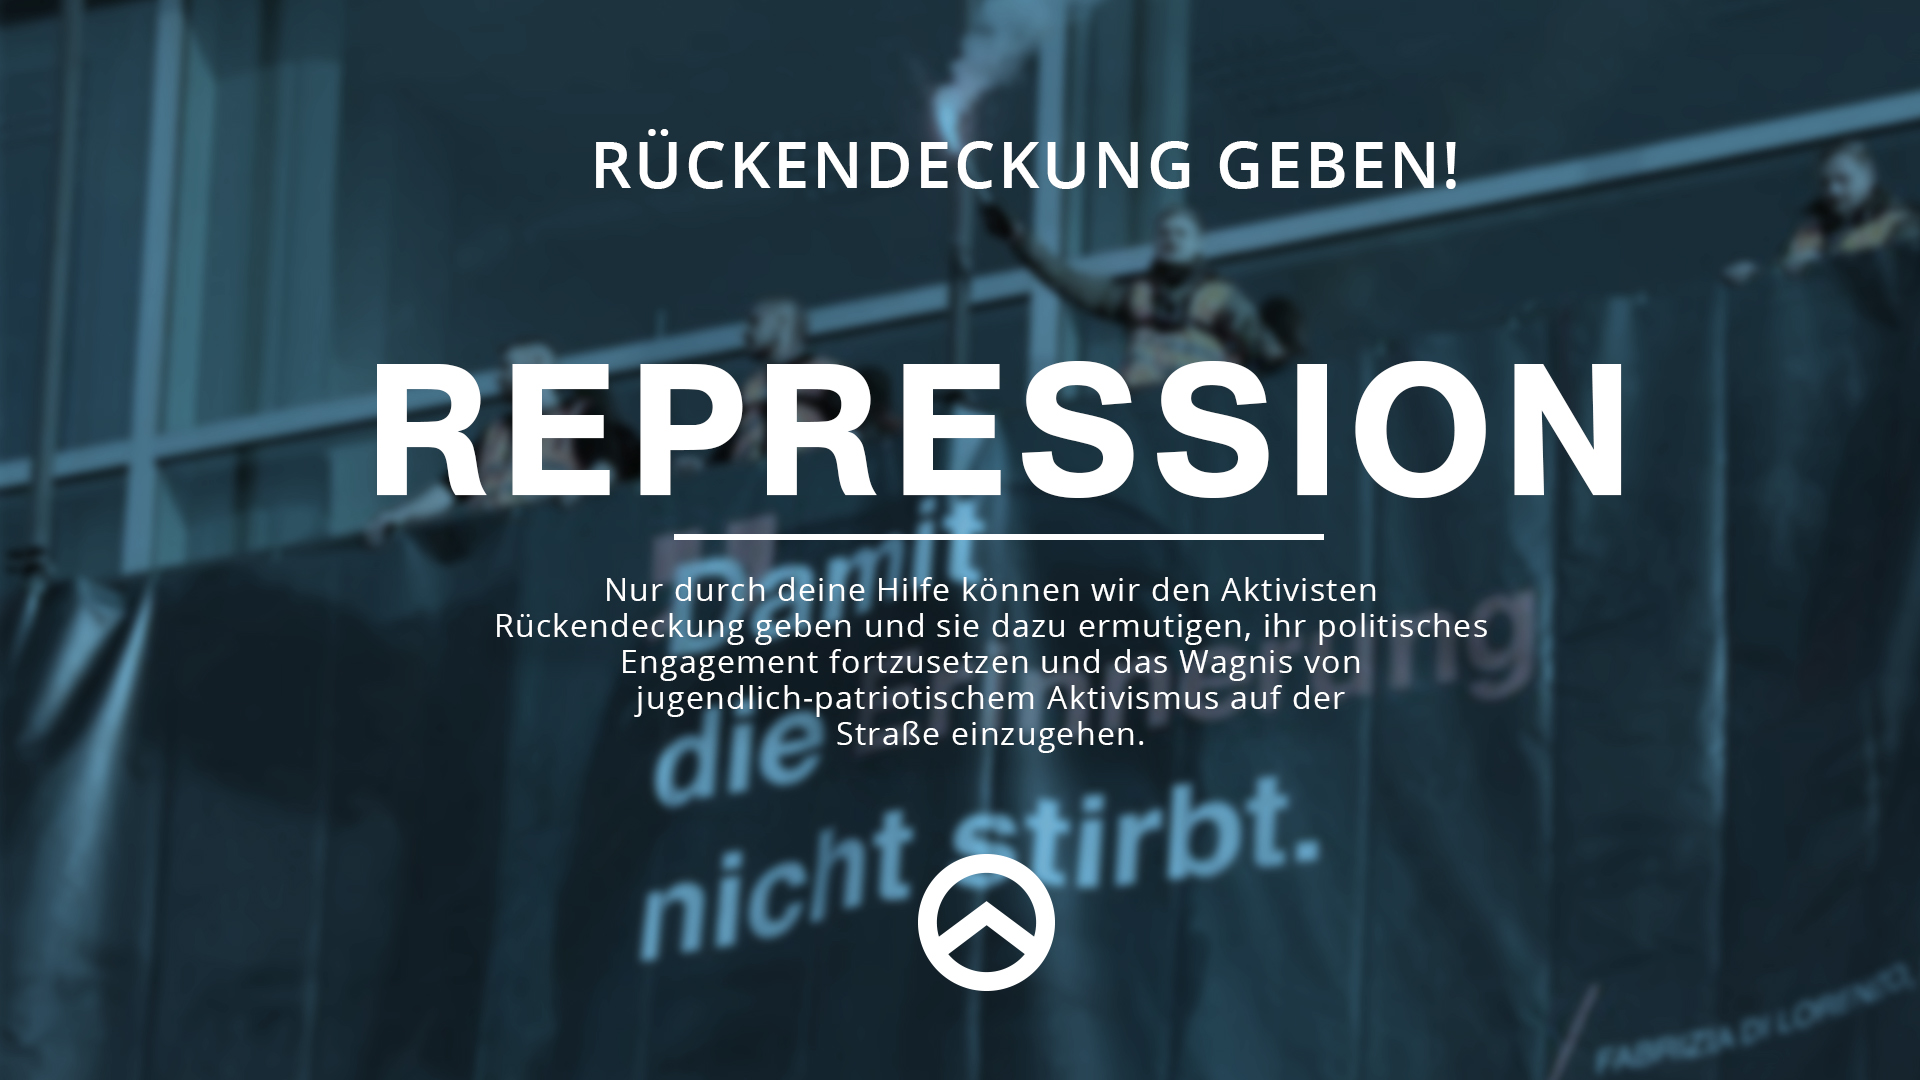 [Bild: Repression-Grafik.jpg]